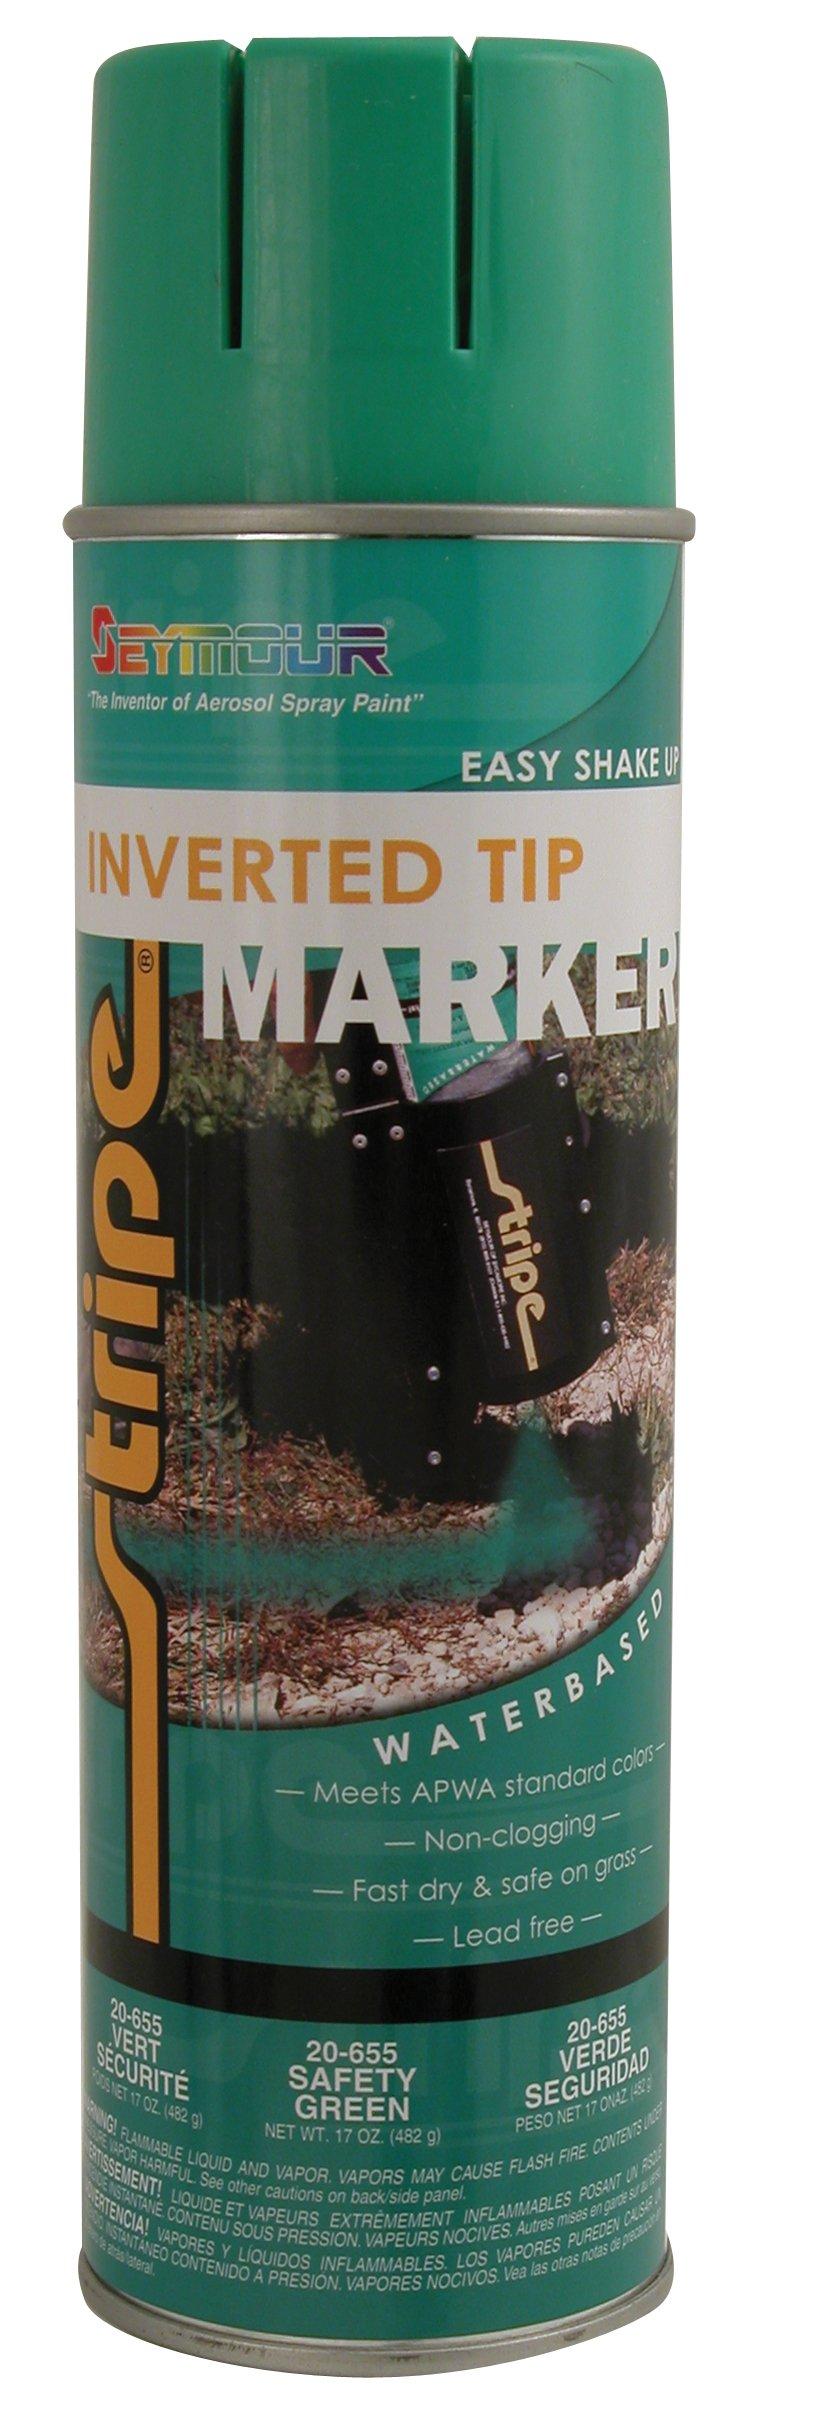 Seymour 20-655 Stripe Inverted Tip Marker, Safety Green